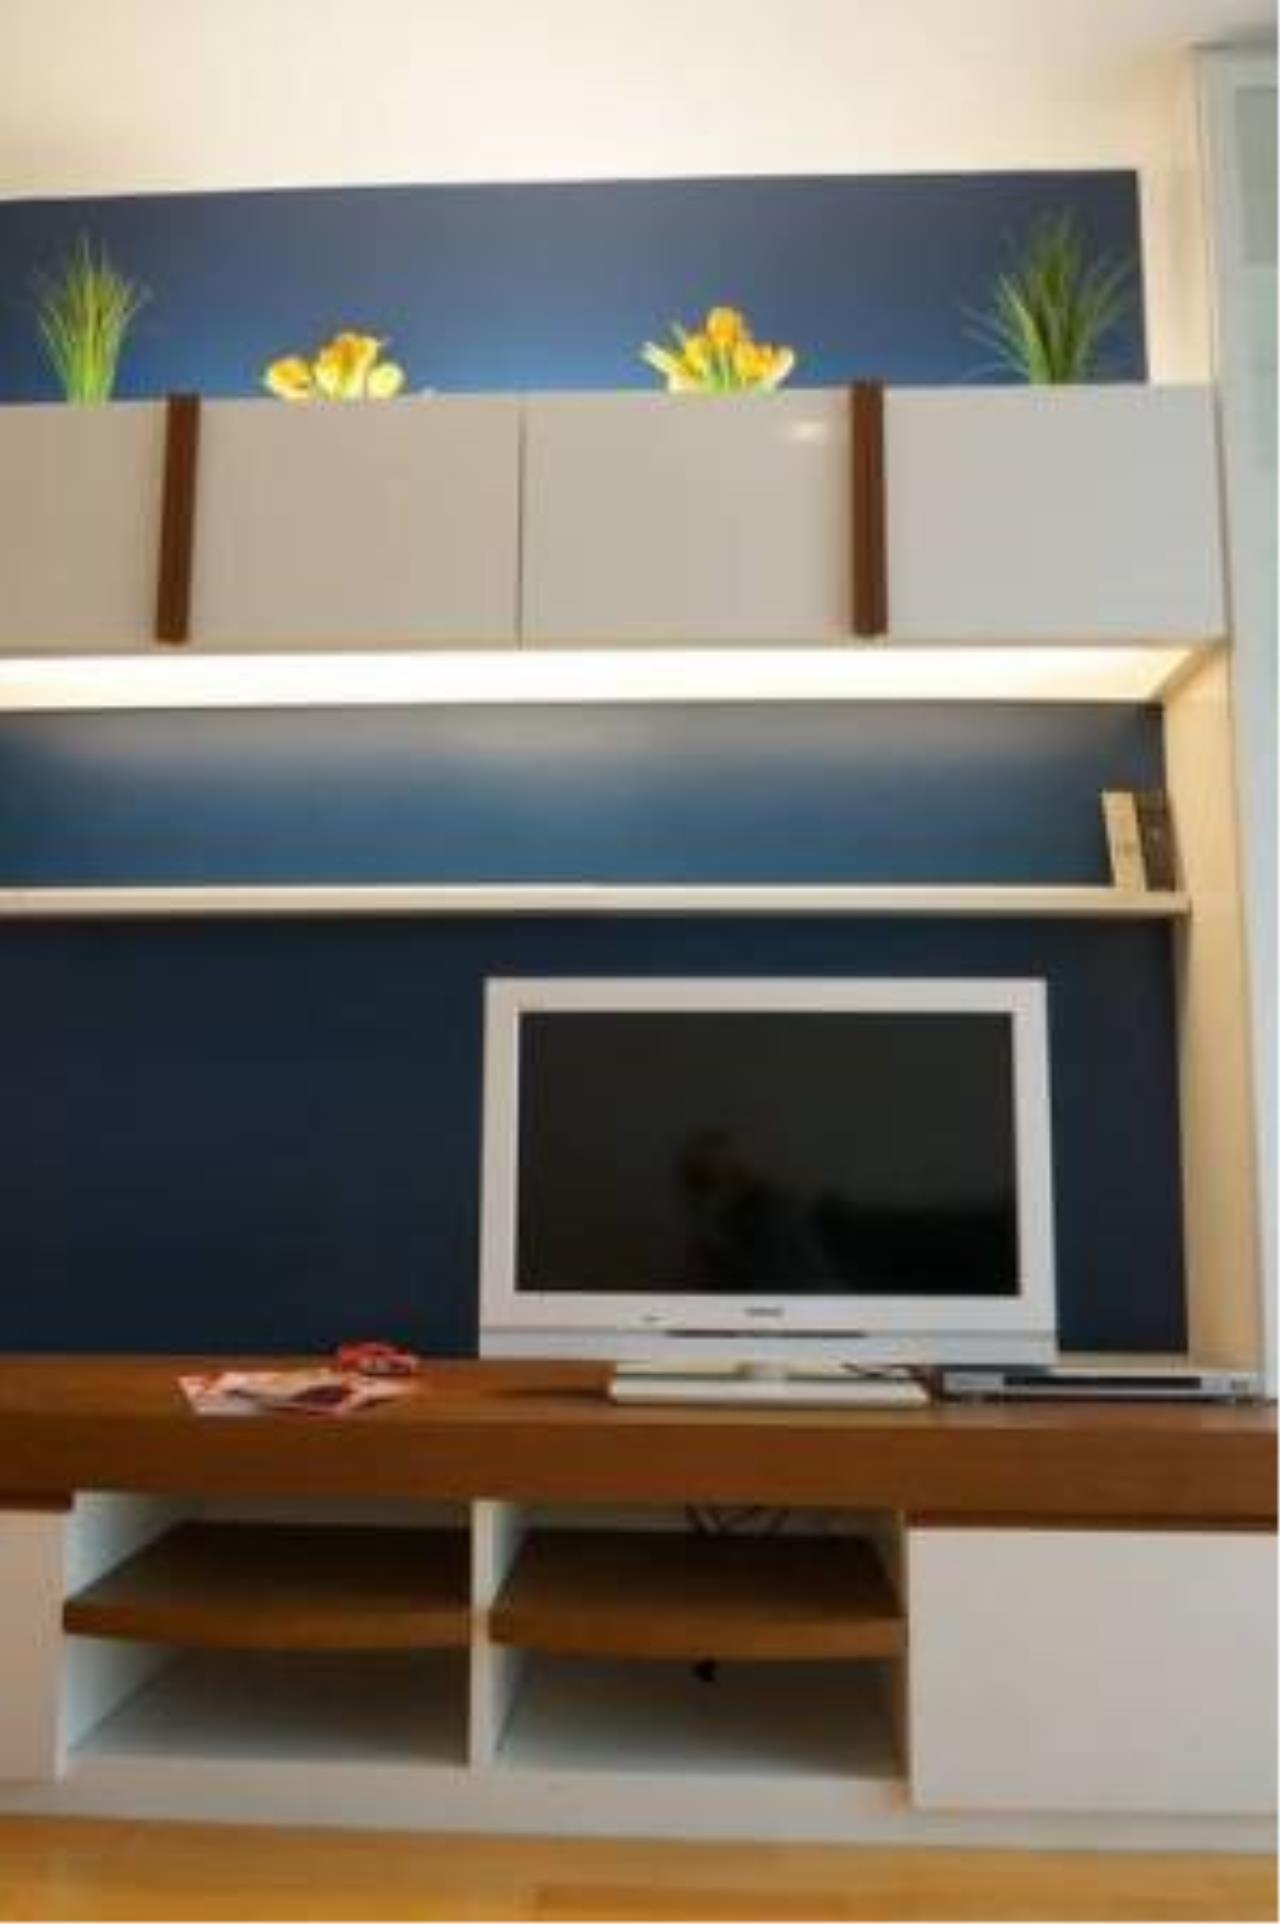 BKK Condos Agency's 2 bedroom condo for rent at Issara@42 11